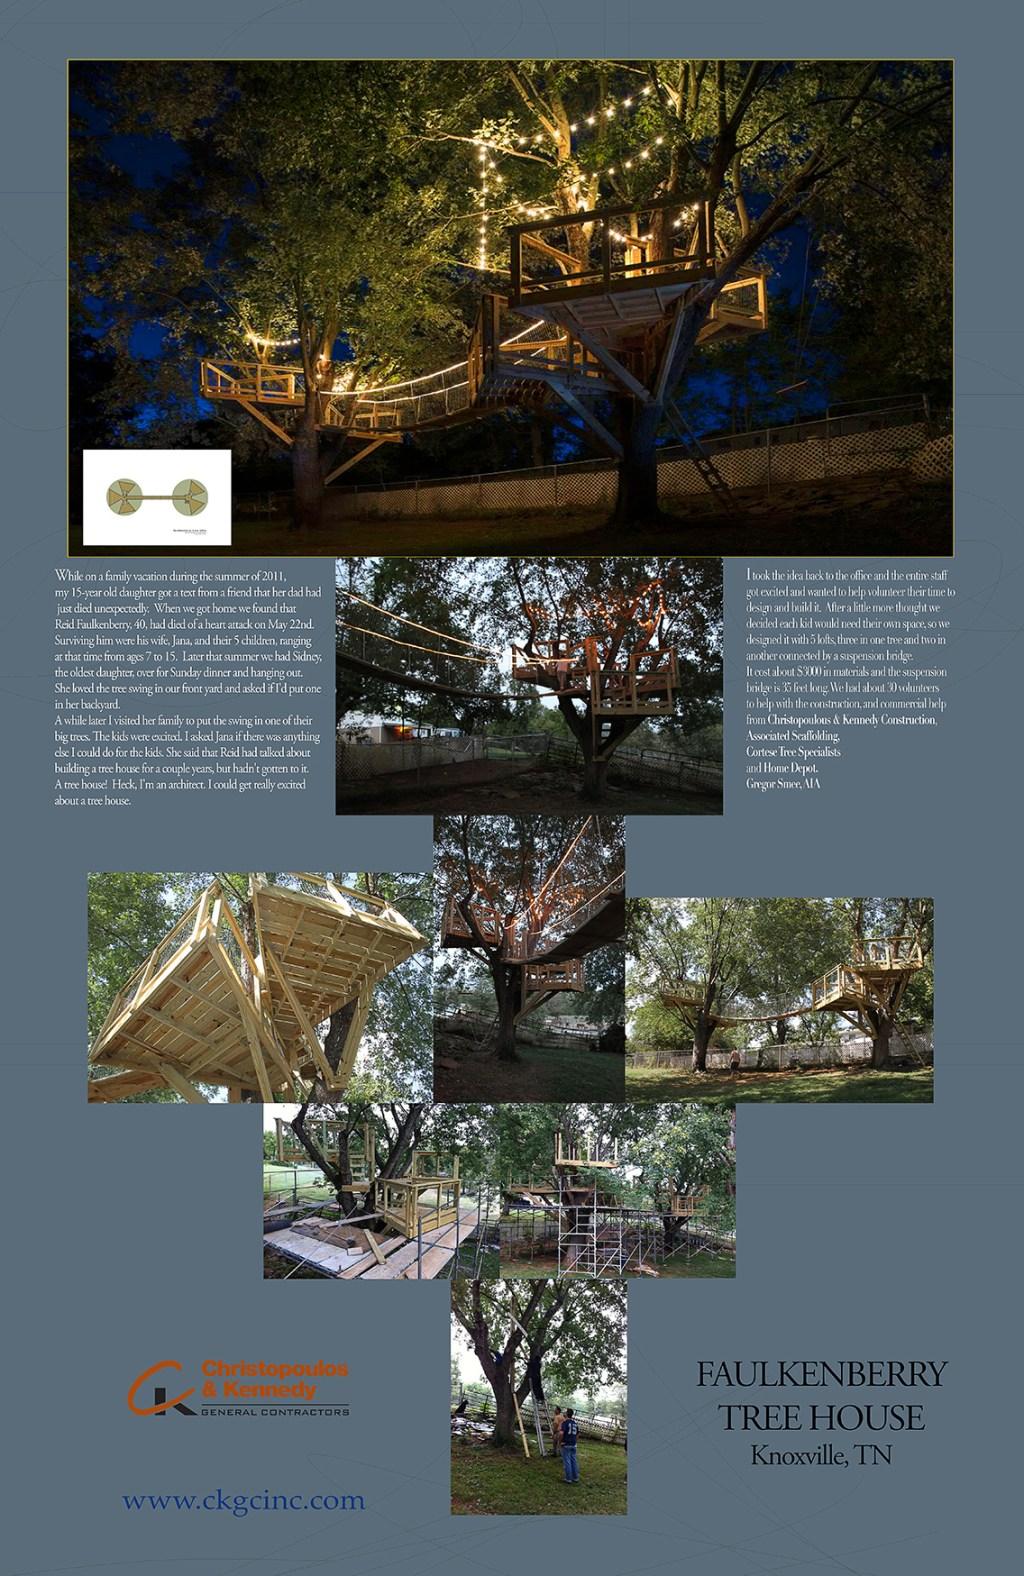 Faulkenberry Treehouse